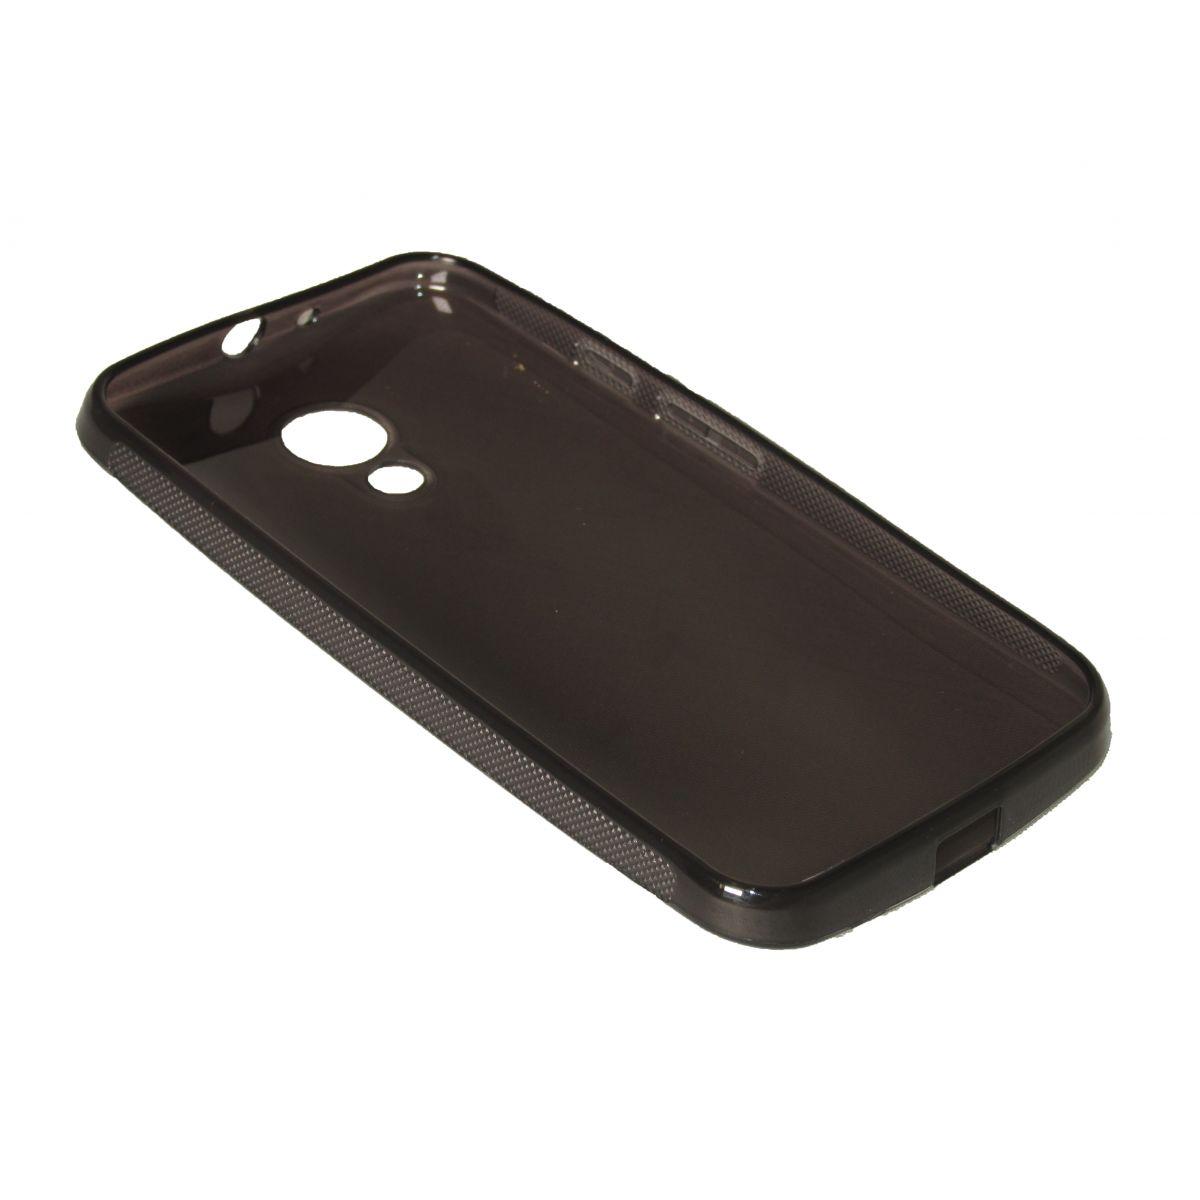 Capa TPU Grafite Motorola Moto G2 Xt1069 + Película Flexível